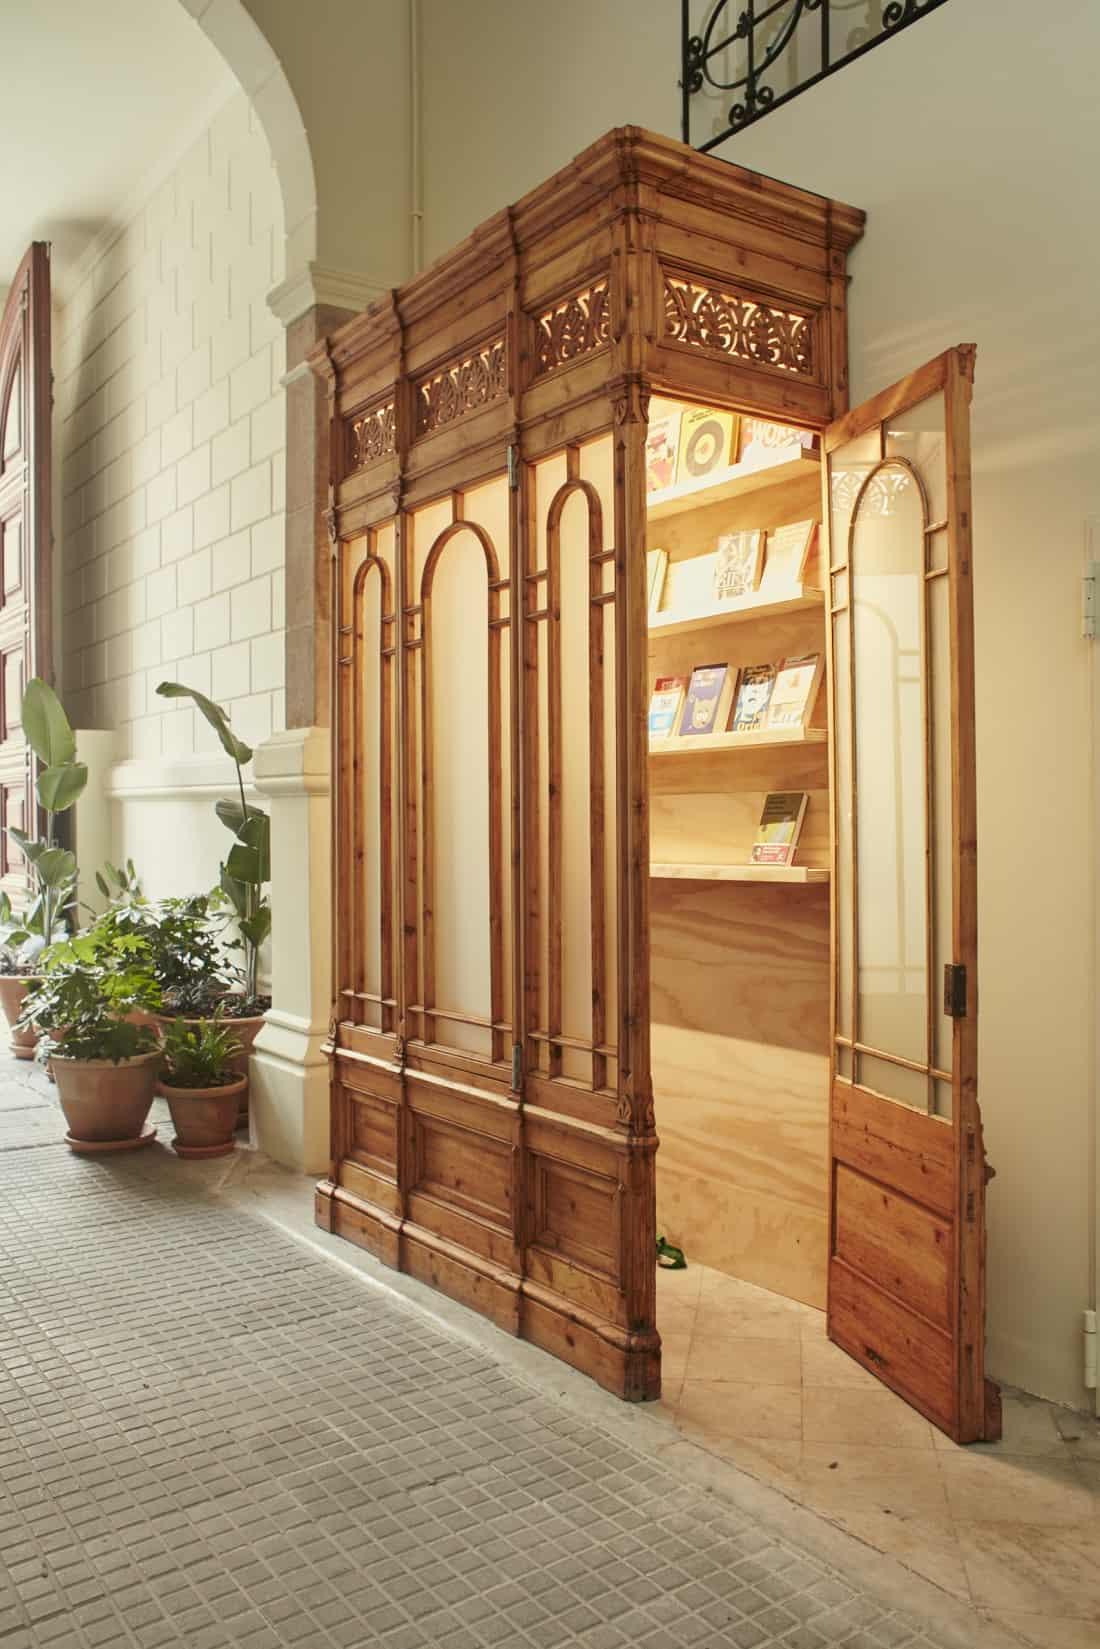 CasaBonay Bookshop Entrance ( c ) Nacho Alegre